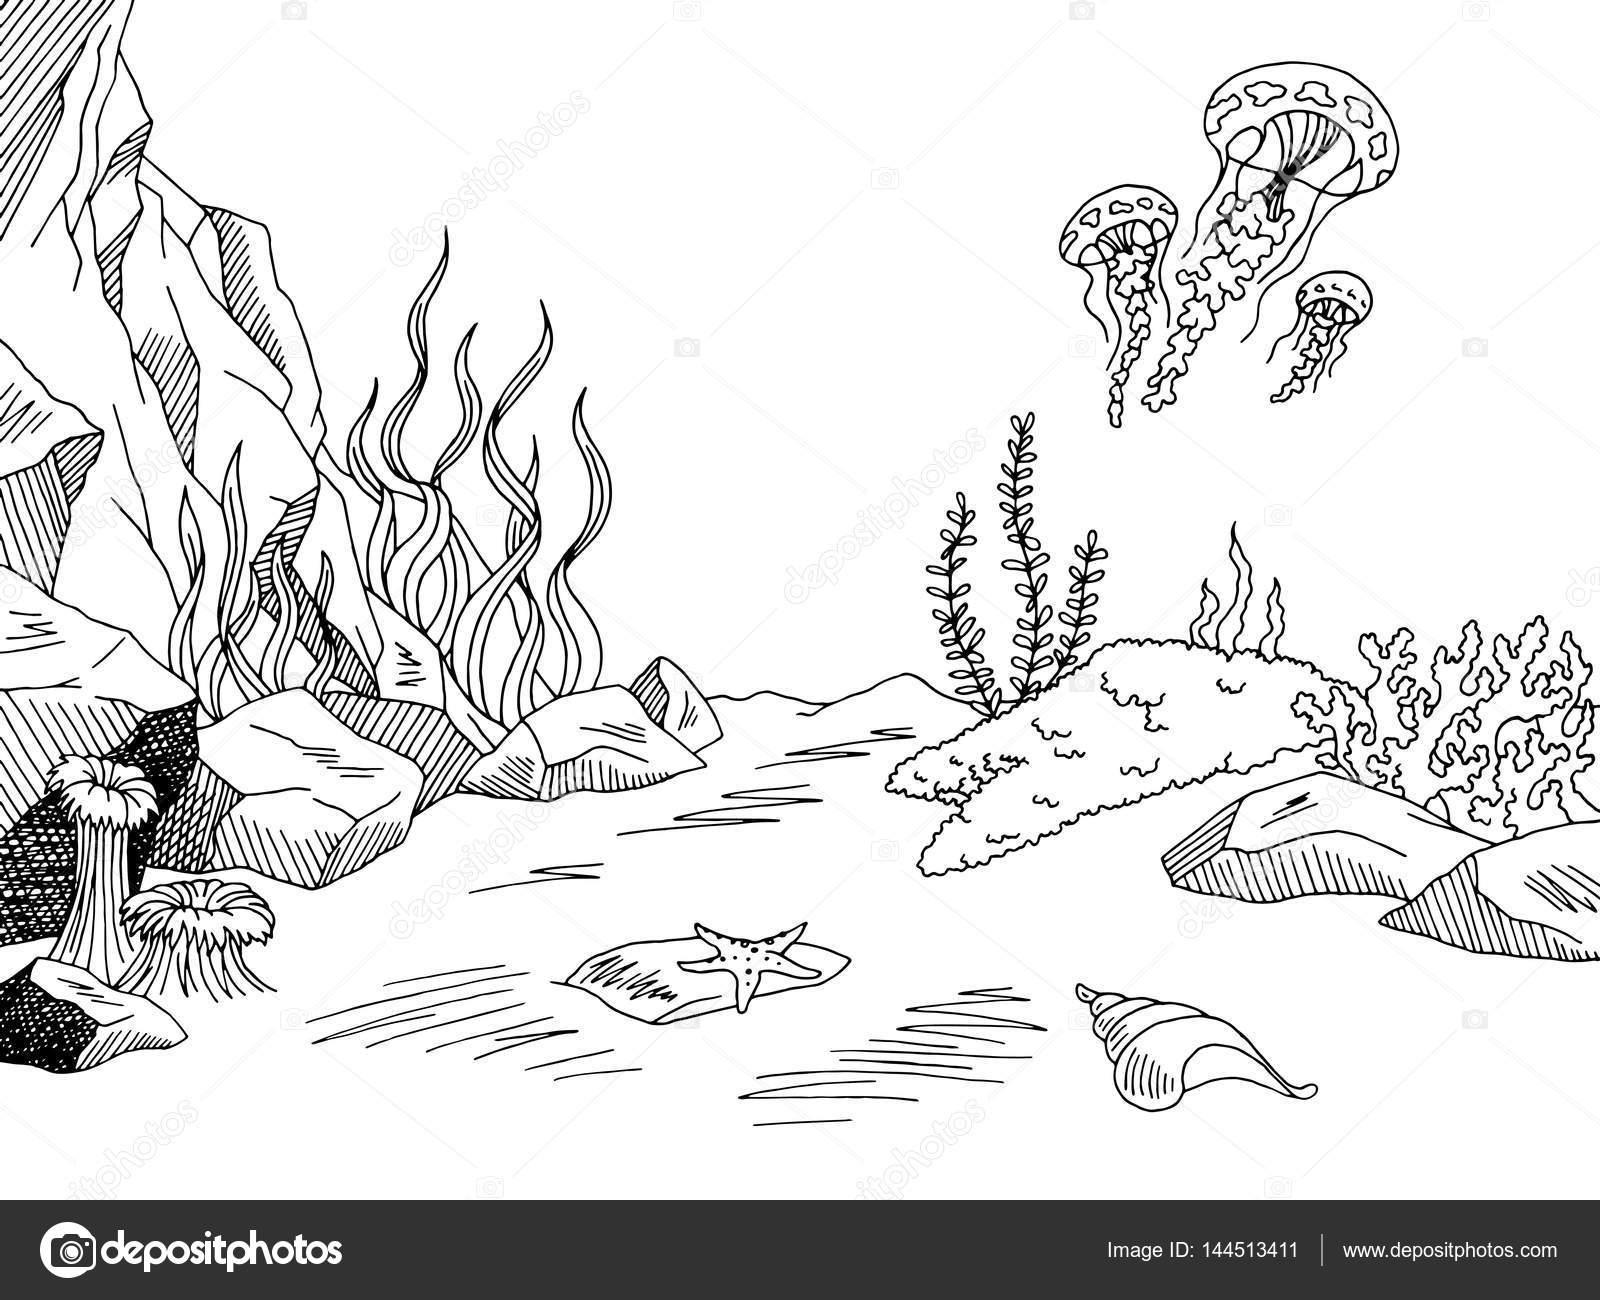 Underwater Graphic Sea Black White Sketch Illustration